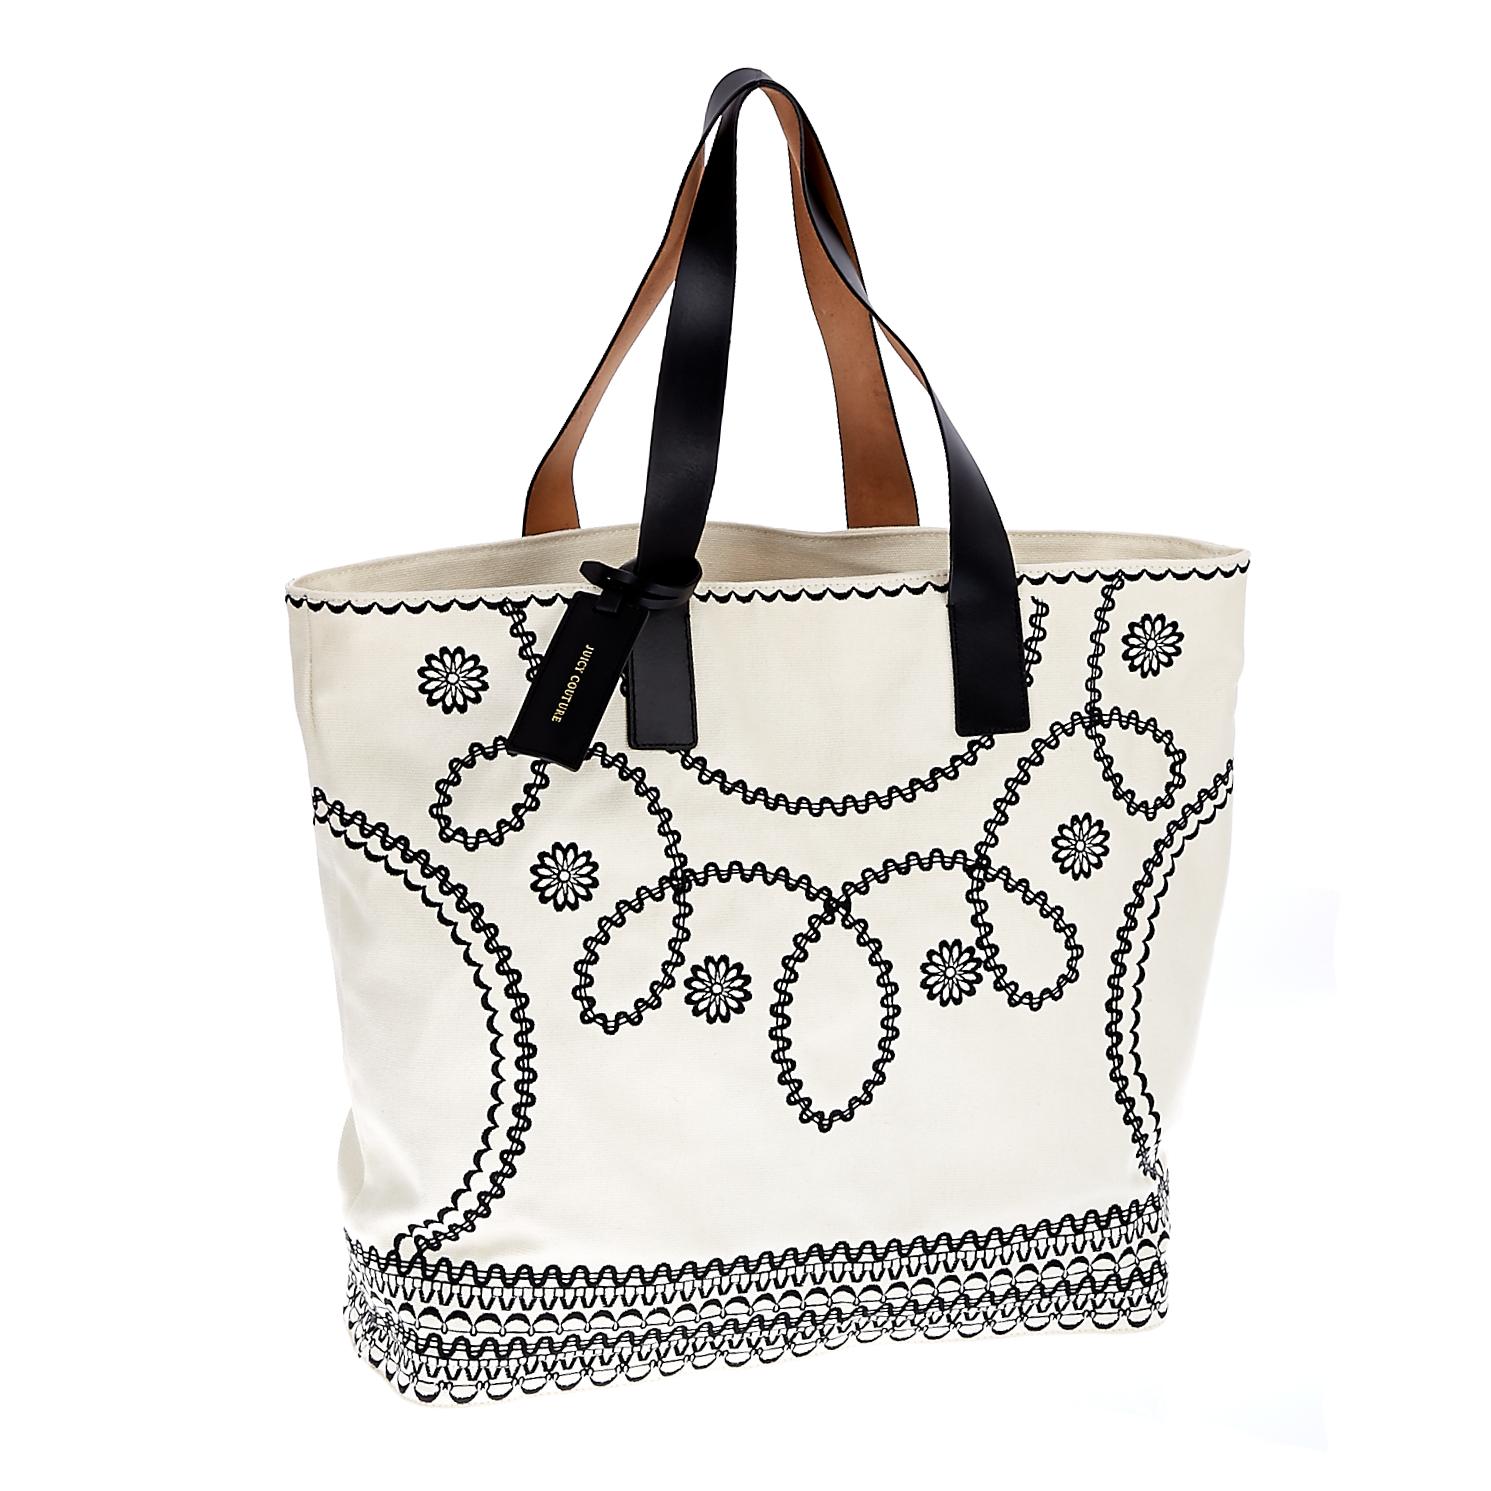 JUICY COUTURE - Γυναικεία τσάντα Juicy Couture μπεζ γυναικεία αξεσουάρ τσάντες σακίδια ωμου